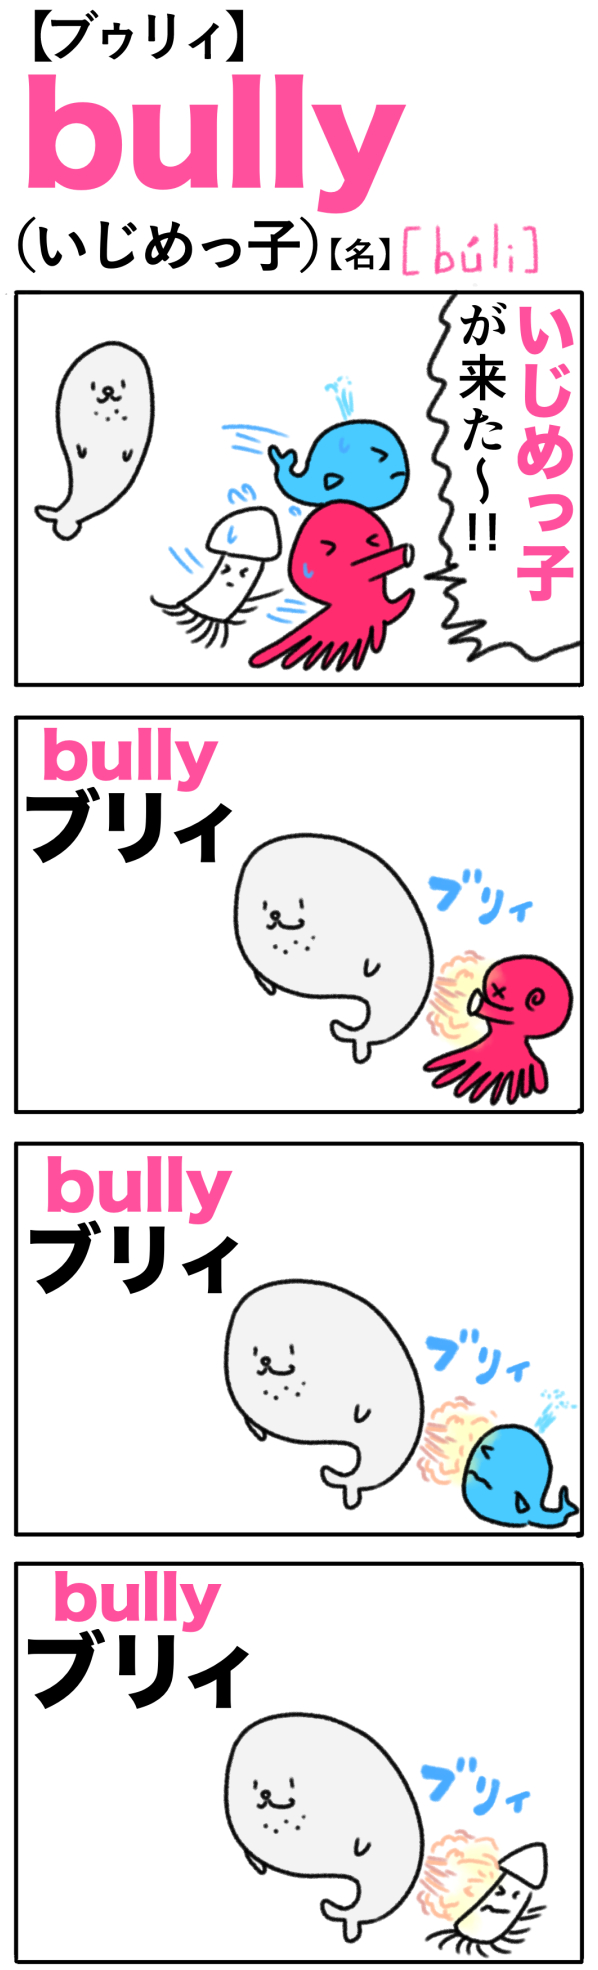 bully(いじめっ子)の語呂合わせ英単語